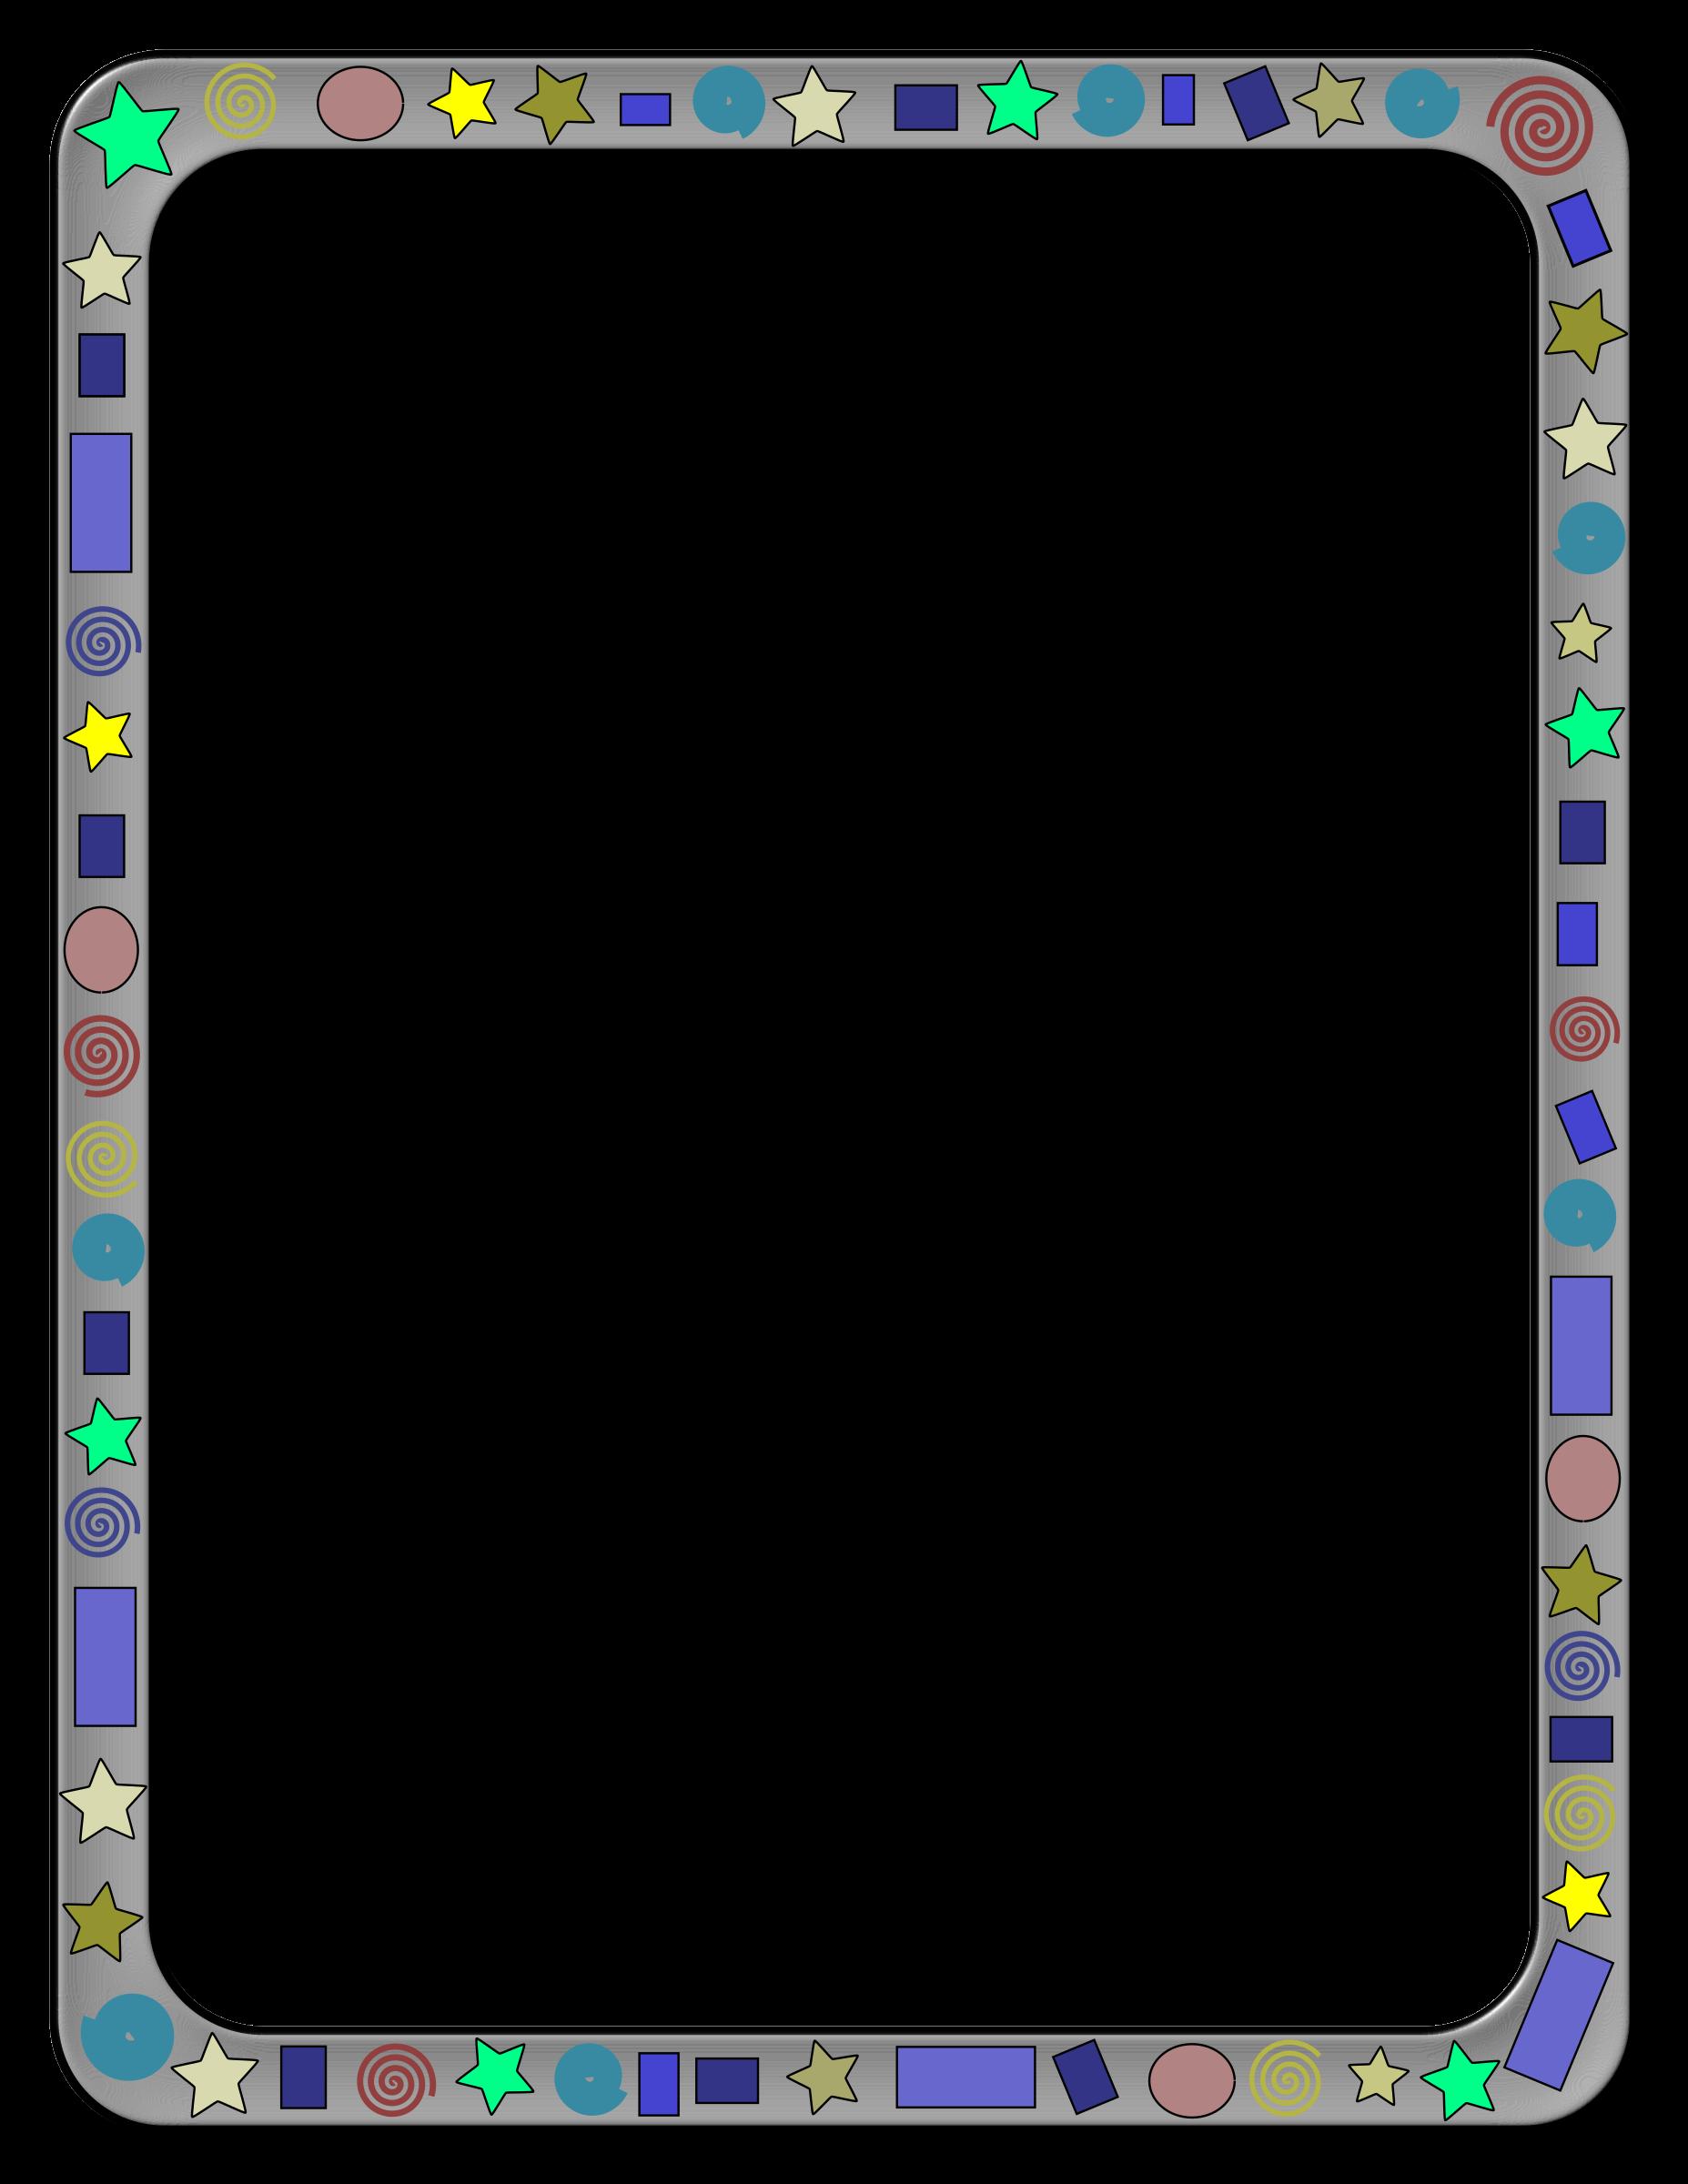 Clipart big image. Abstract border png